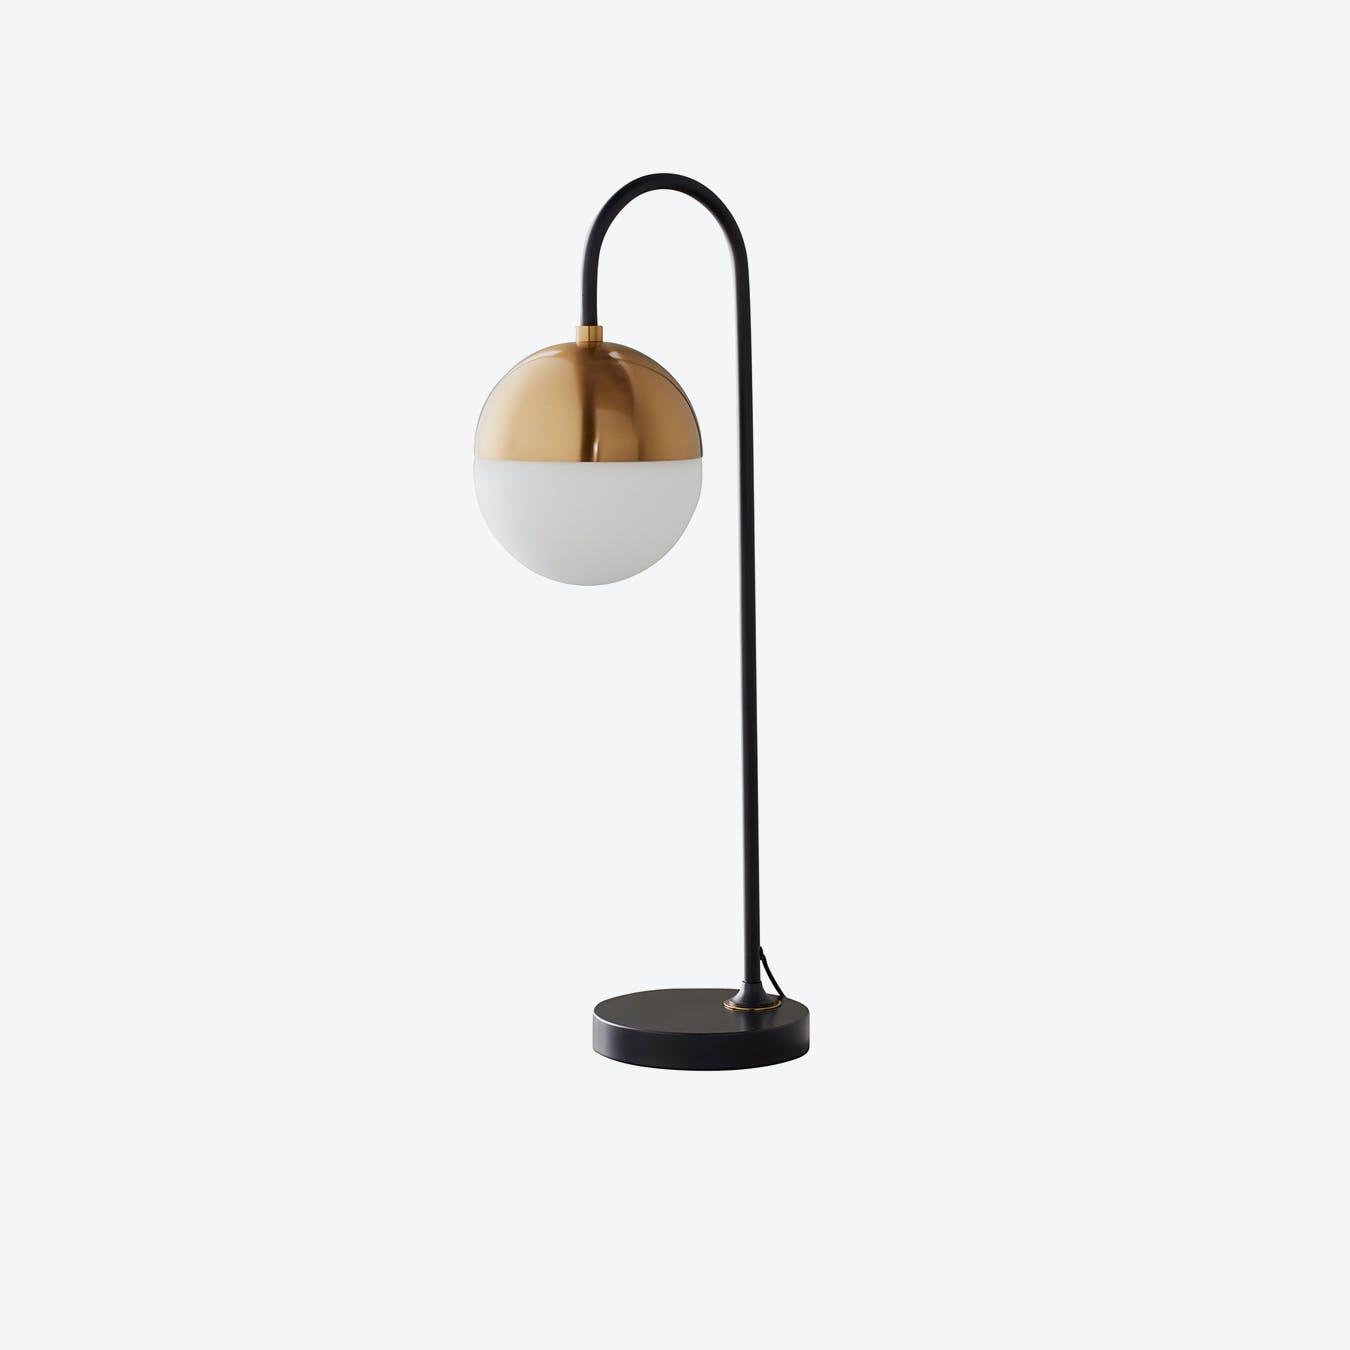 Mayfair Black Gold Table Lamp